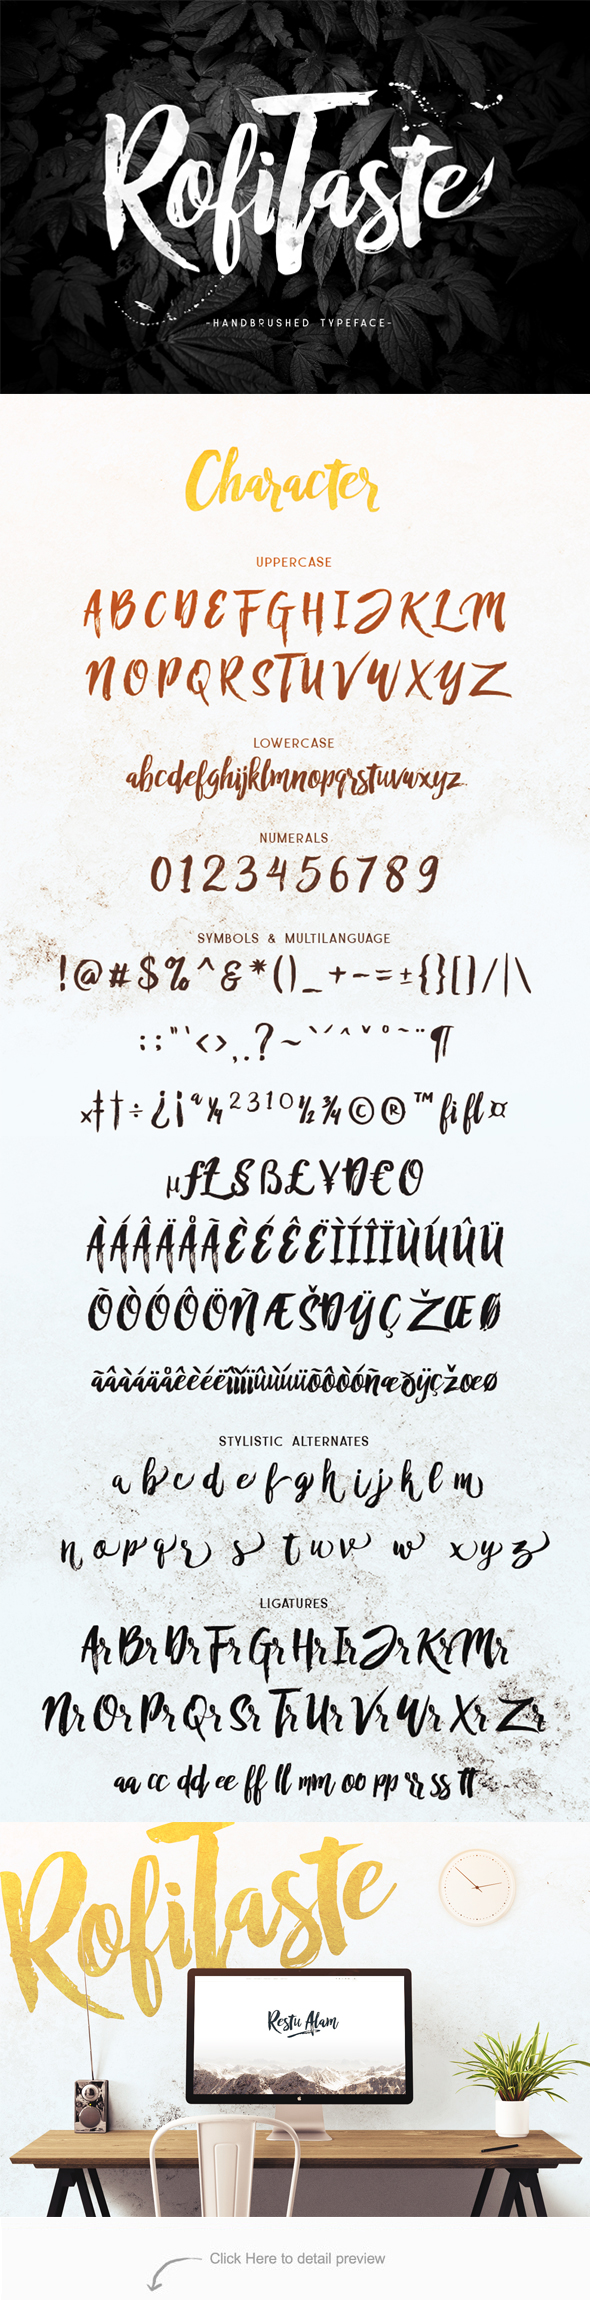 RofiTaste Typeface - Hand-writing Script